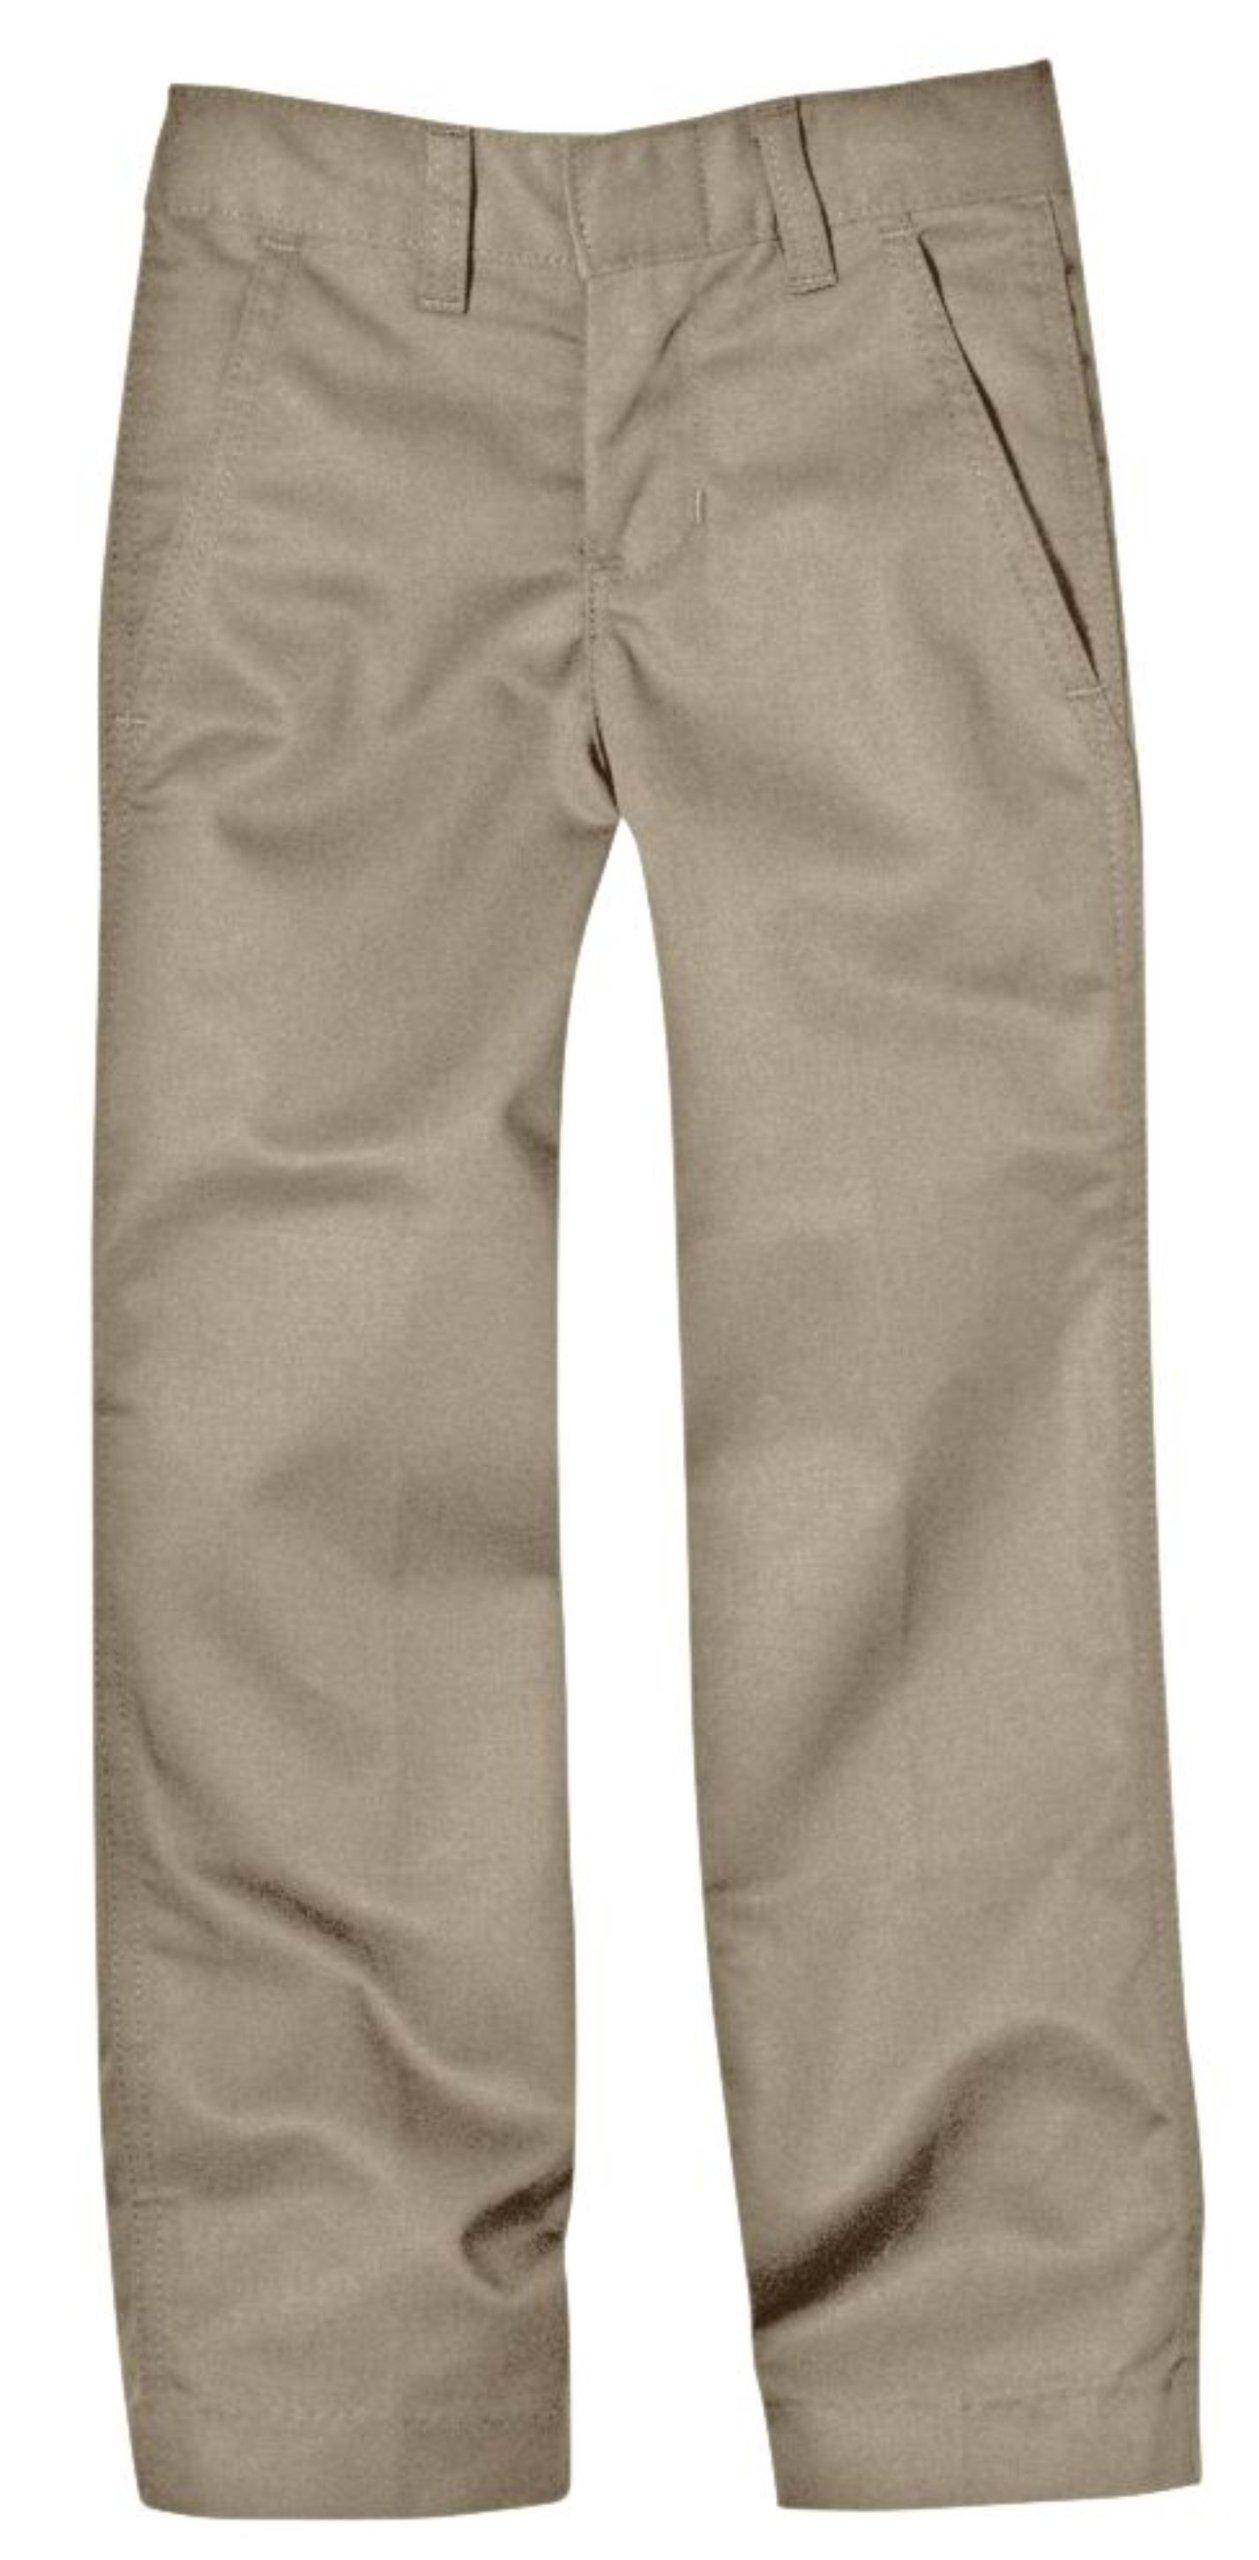 Dickies Boys' Big Flexwaist Flat Front Straight Leg Pant, Khaki, 8 by dickies